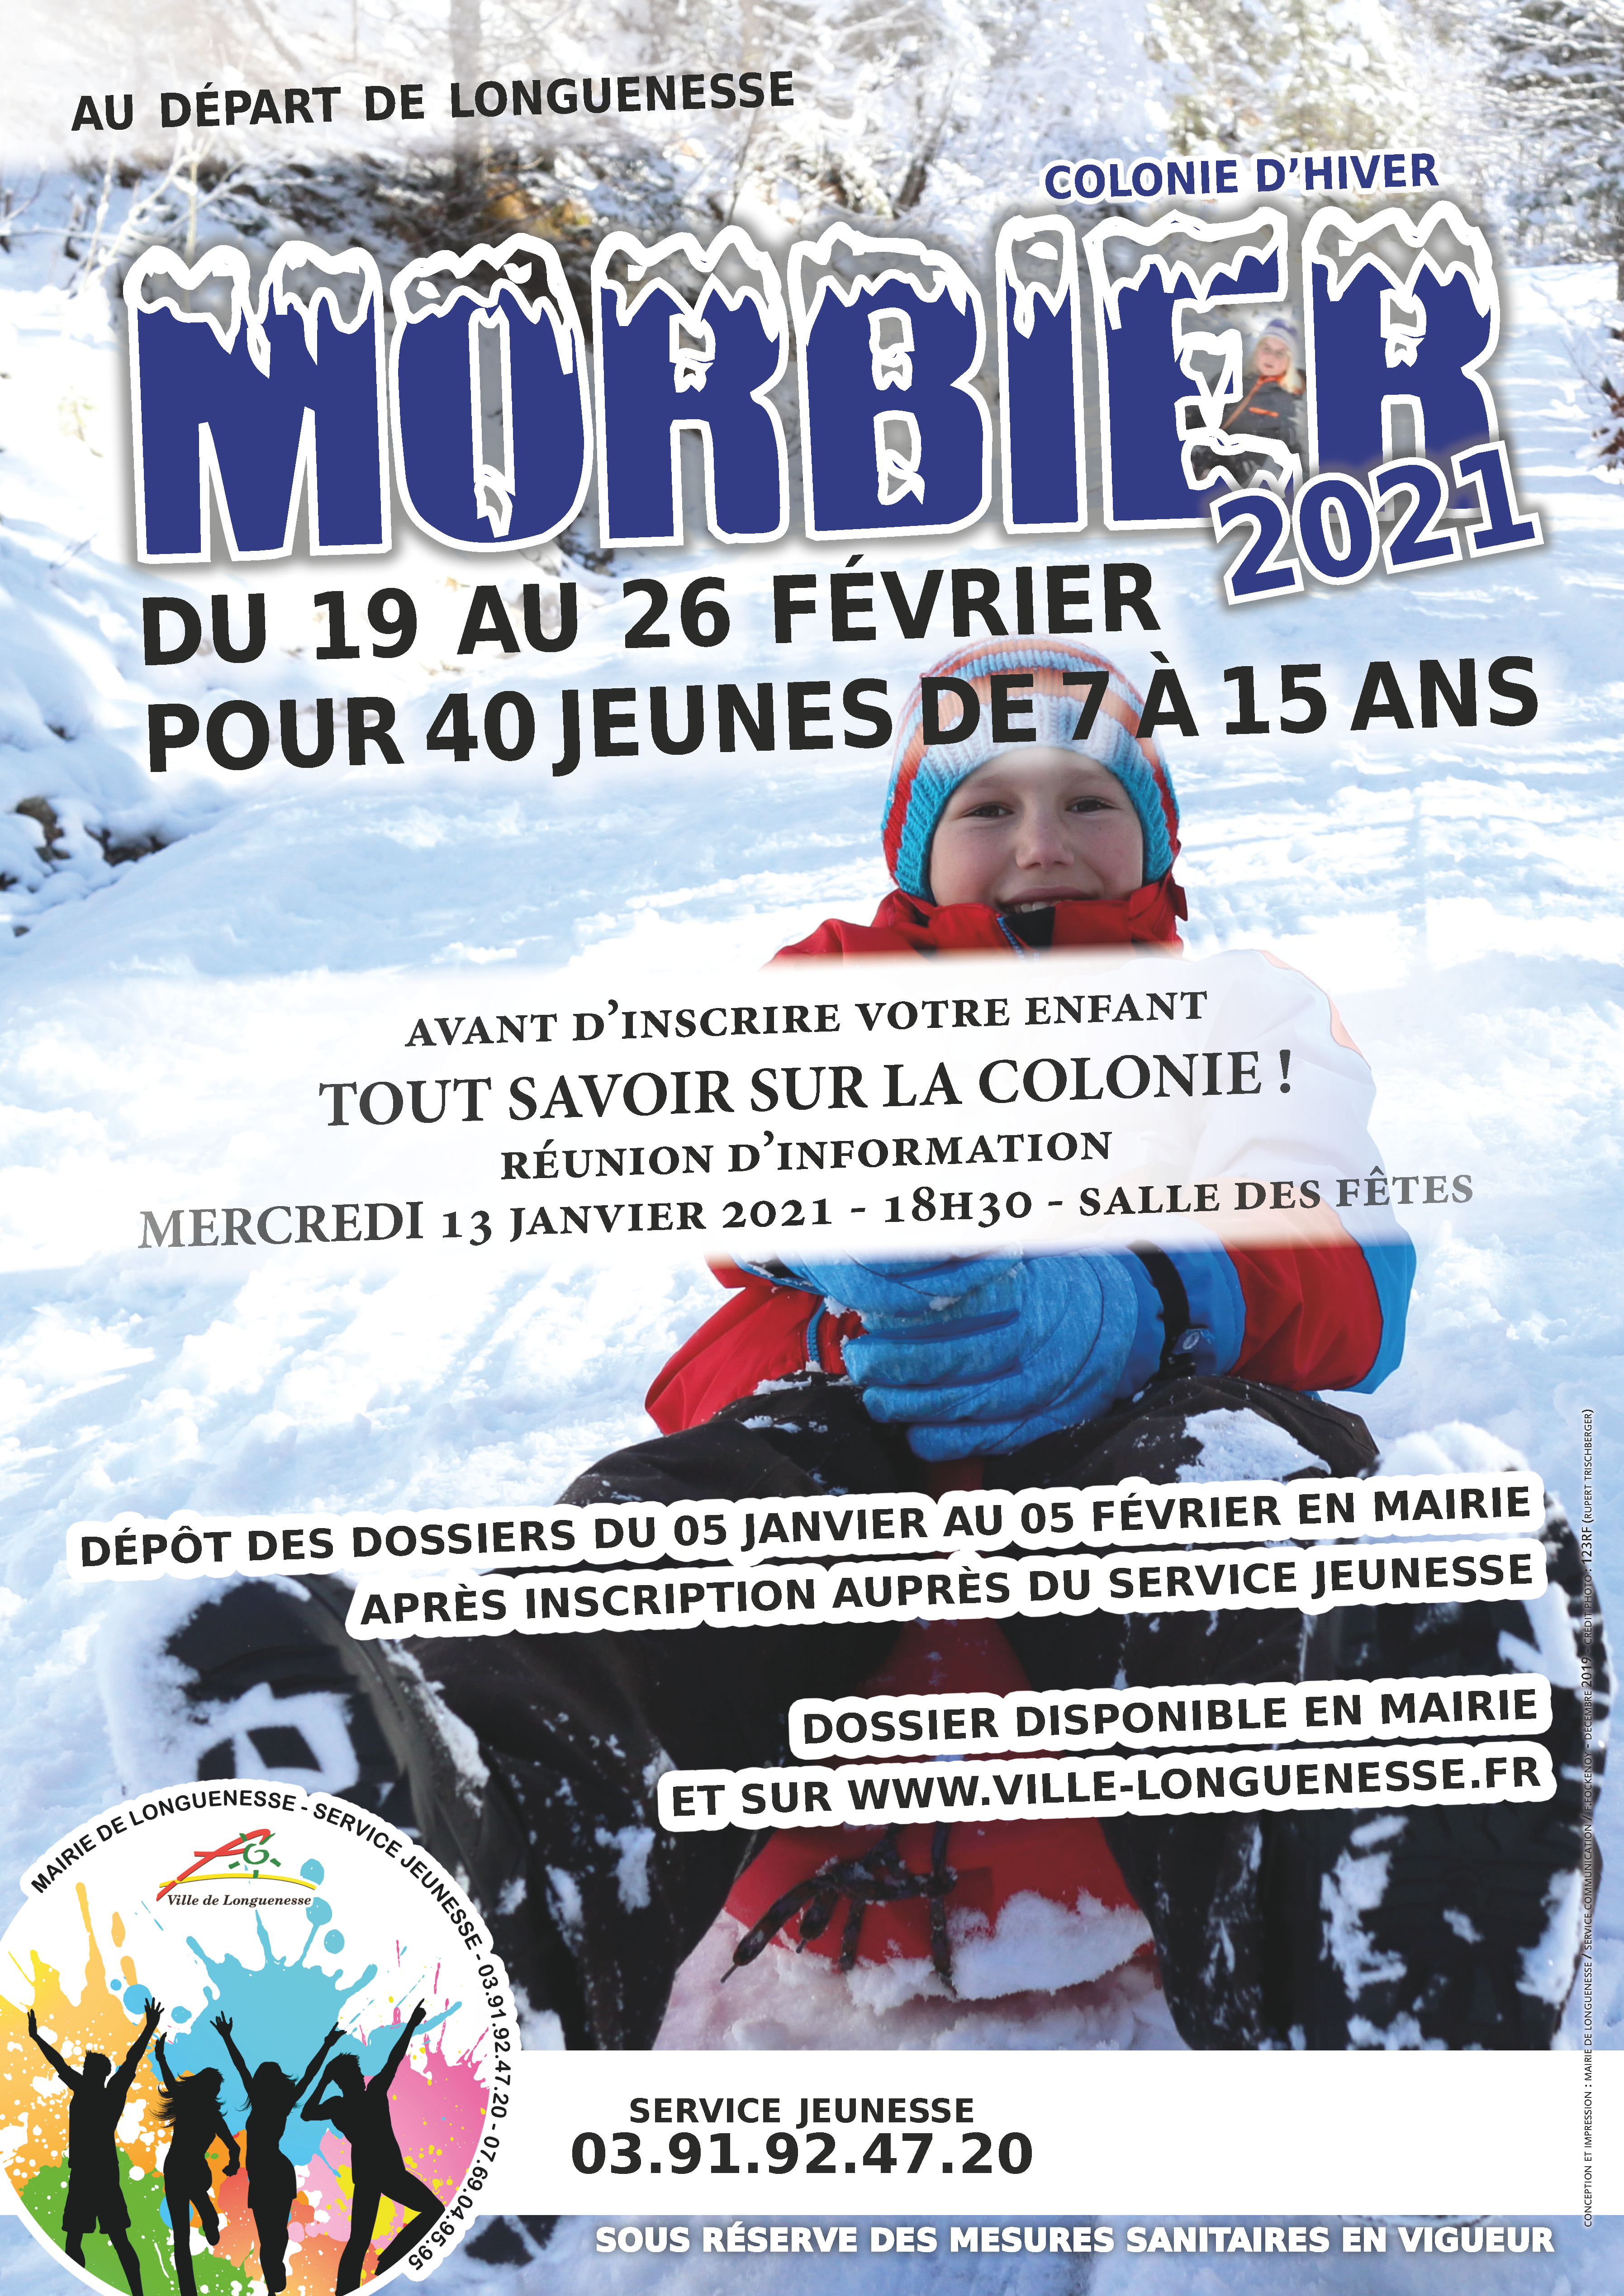 colonie_morbier_hiver_2020_20201210.png